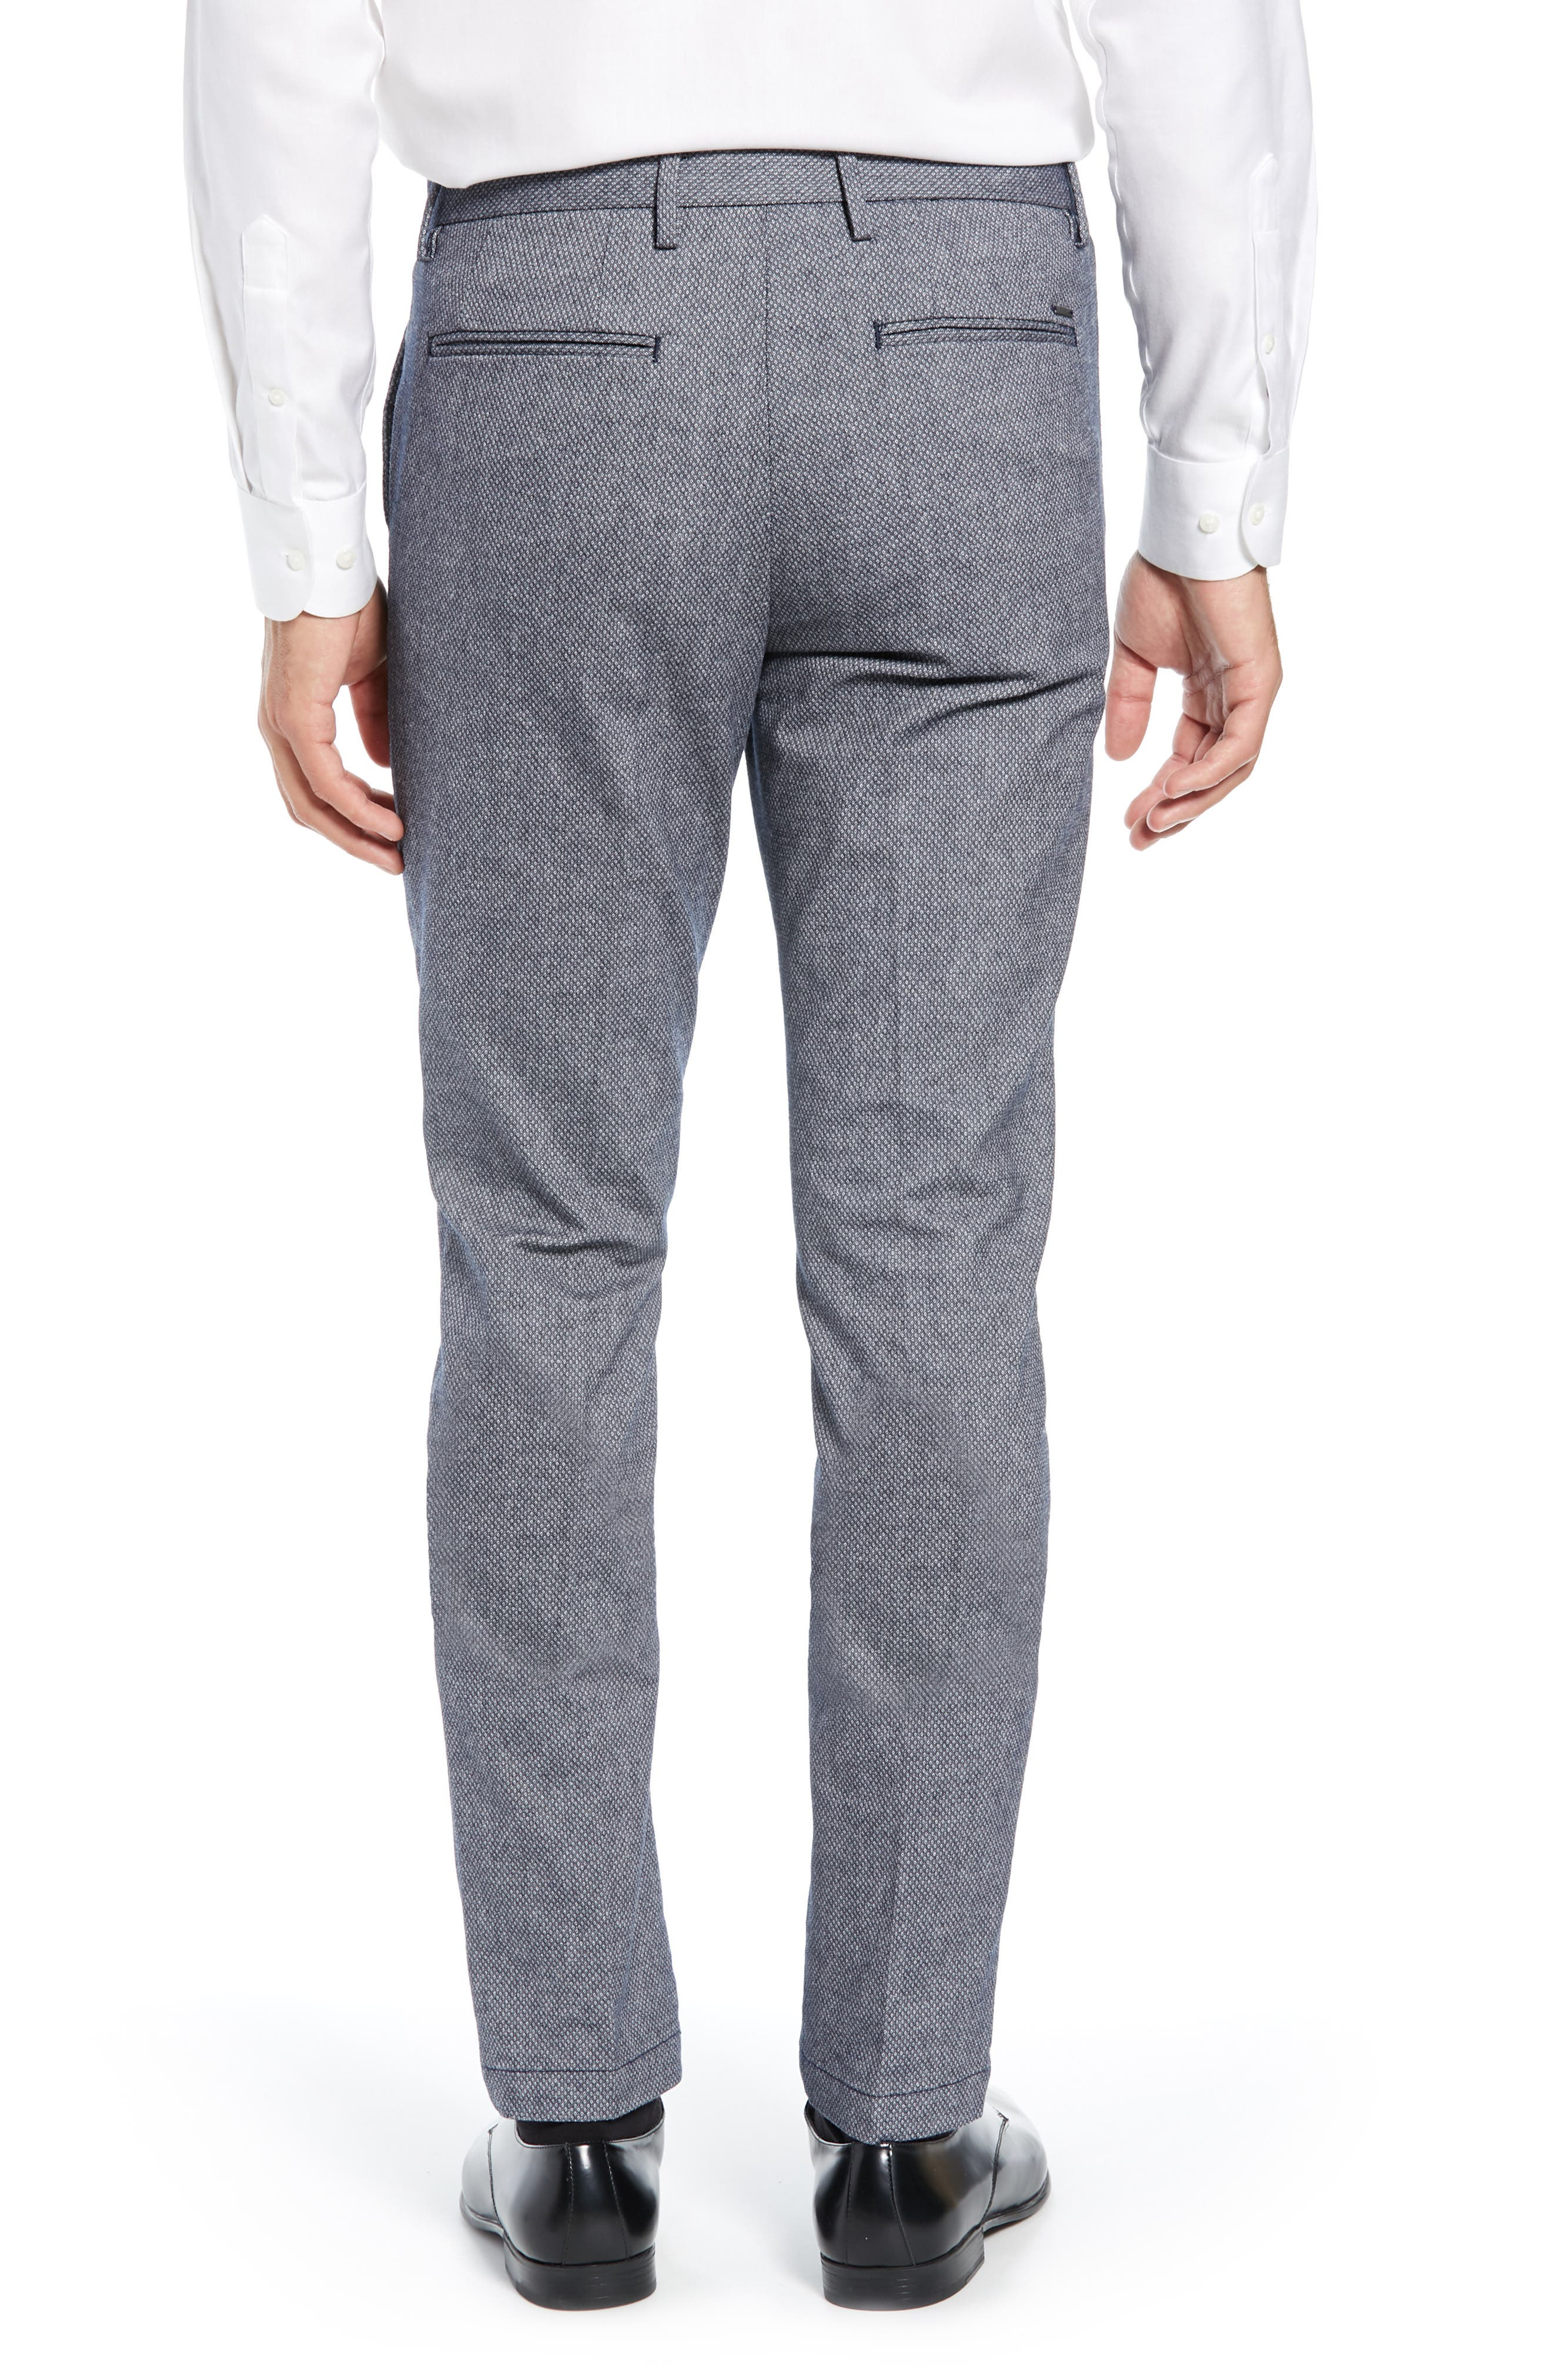 Kaito Slim Fit Pants,                             Alternate thumbnail 2, color,                             NAVY